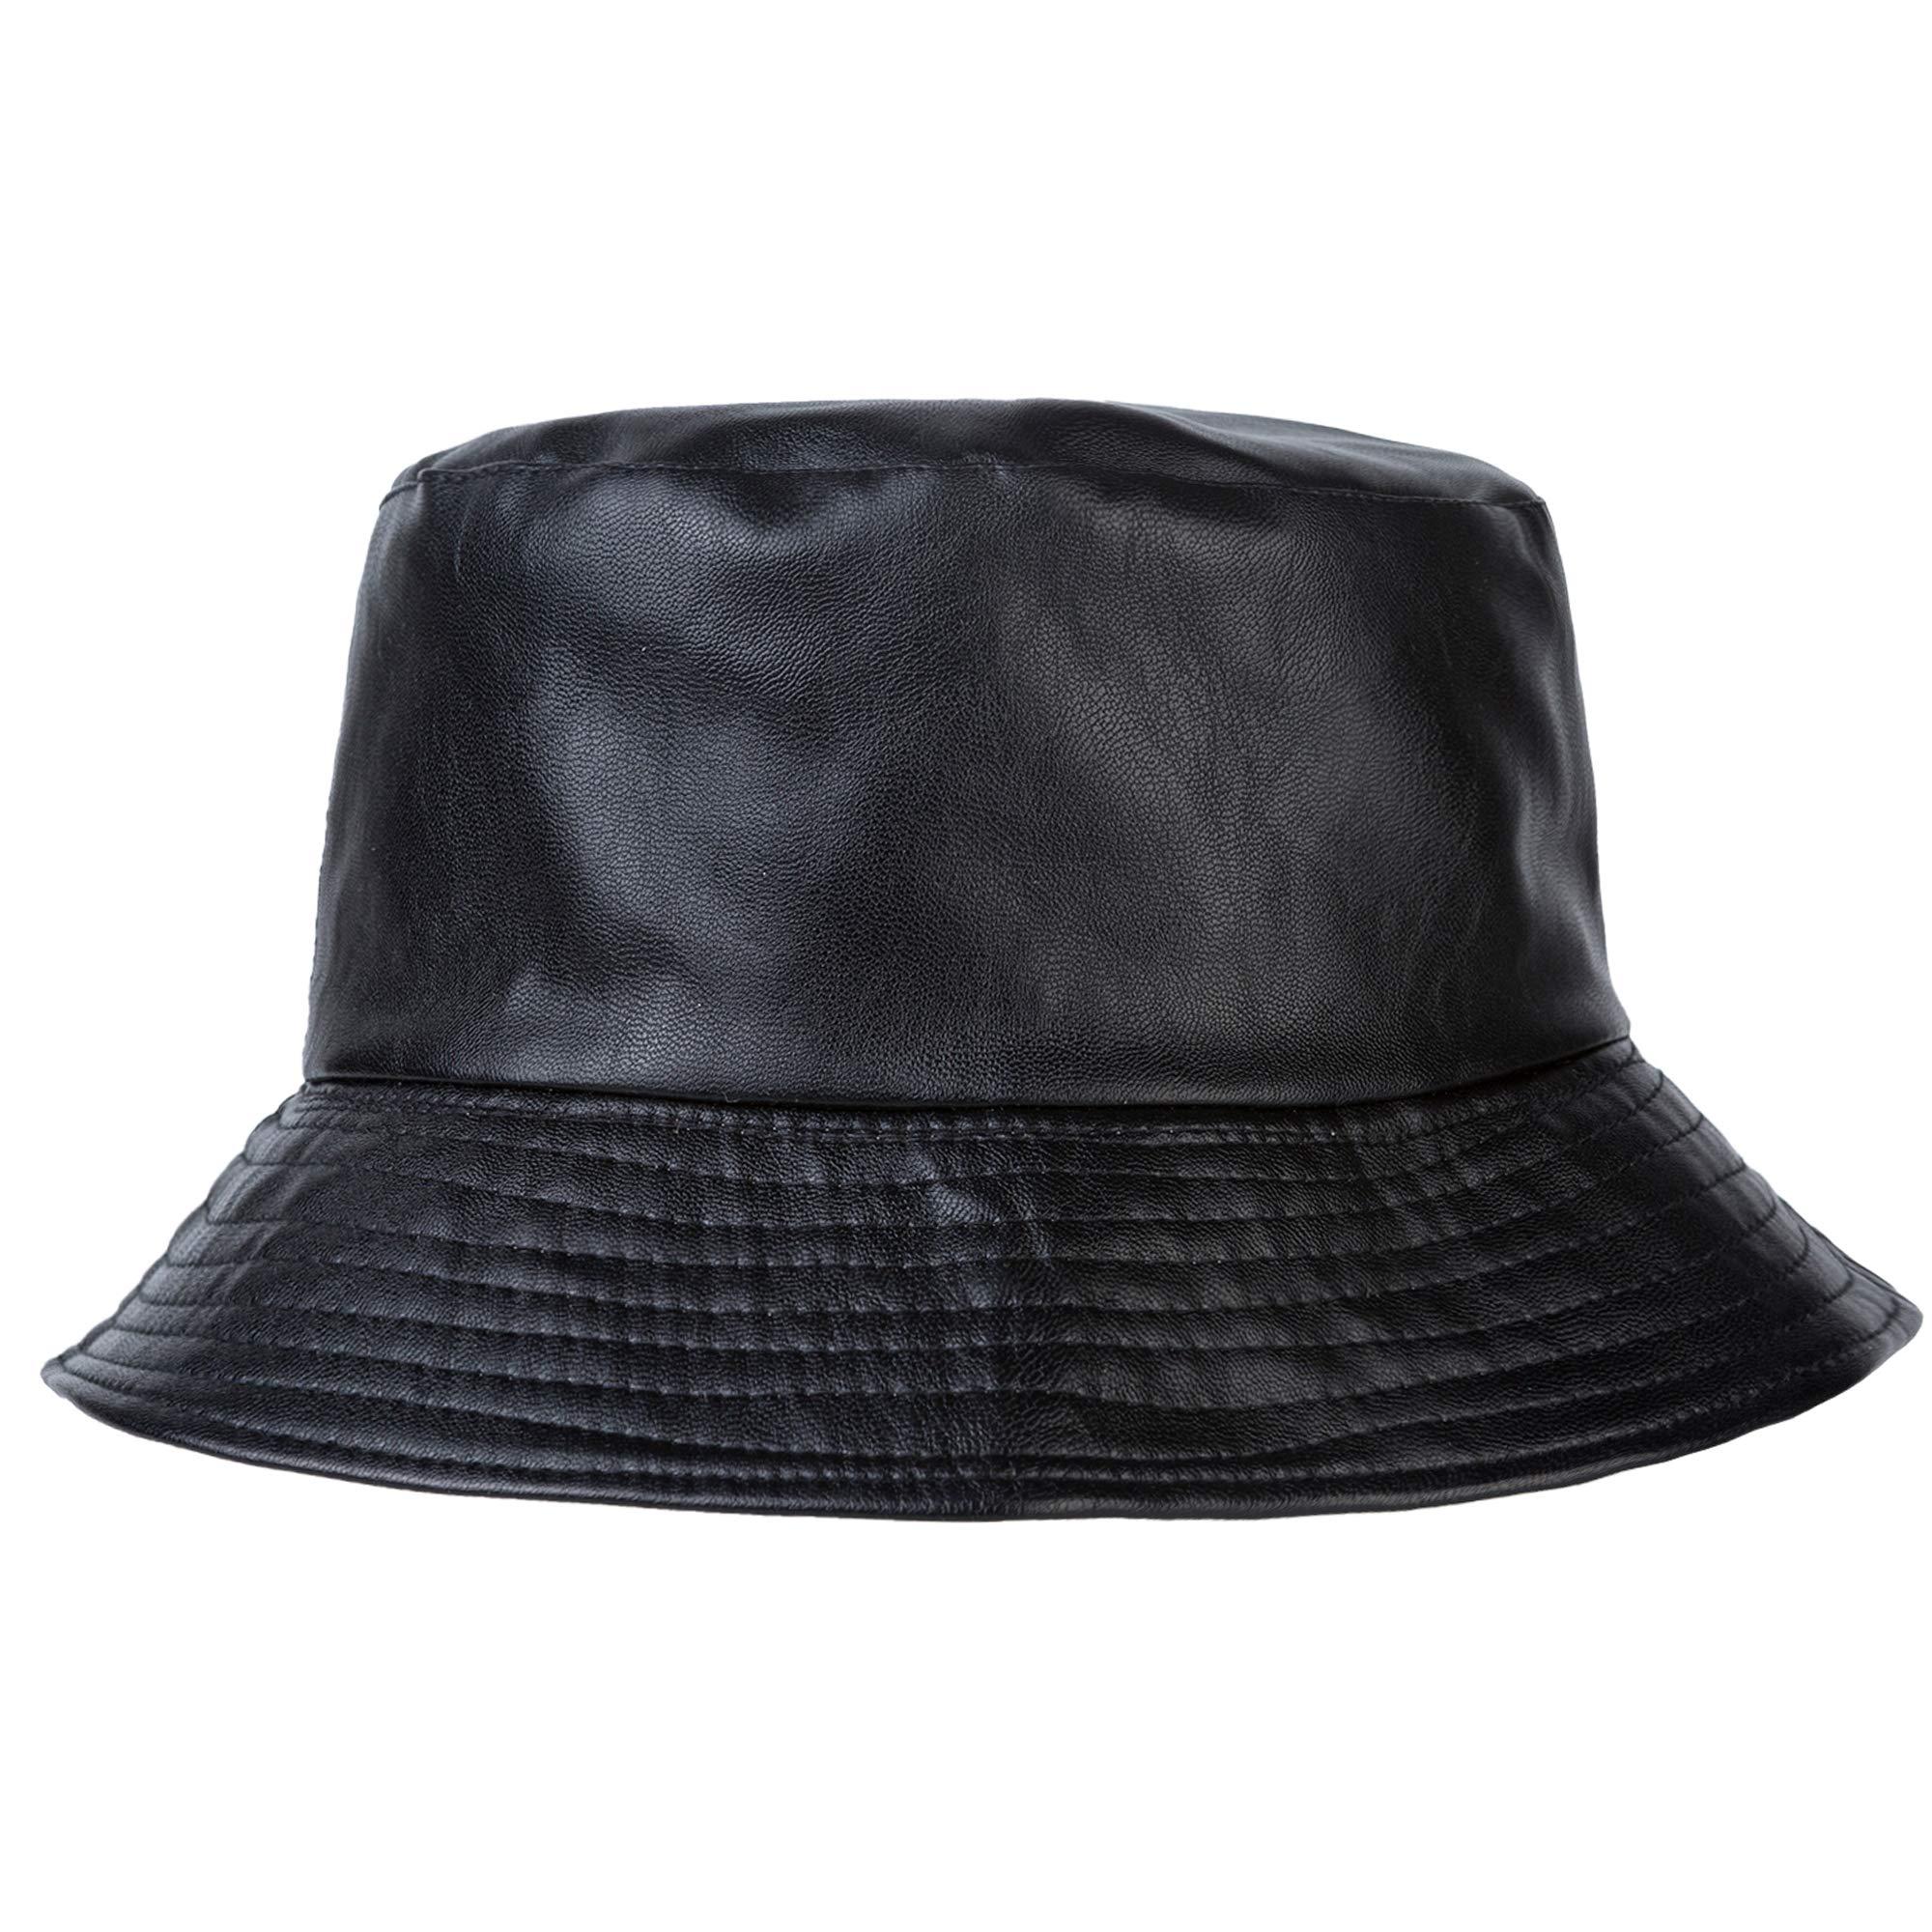 ZLYC Unisex Fashion Bucket Hat PU Leather Rain Hat Waterproof (Black)